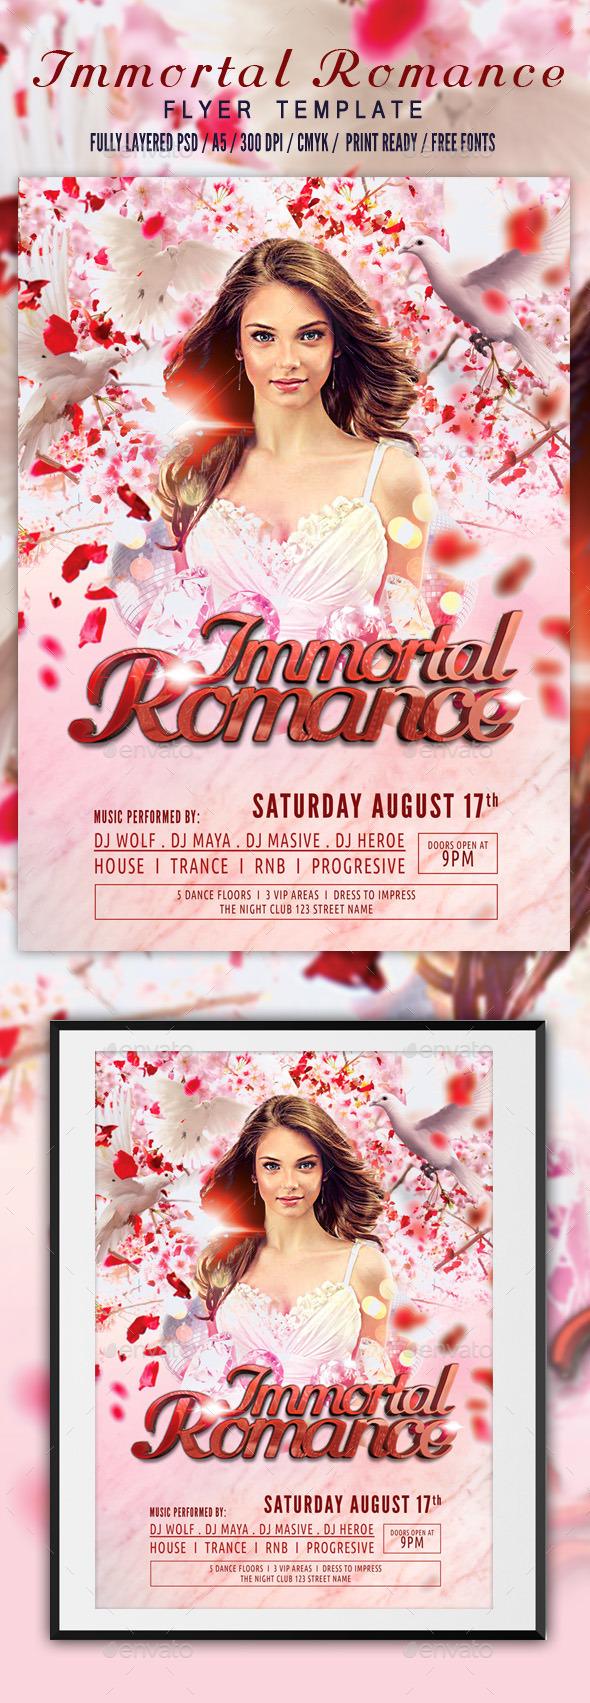 GraphicRiver Immortal Romance Flyer Template 11426691